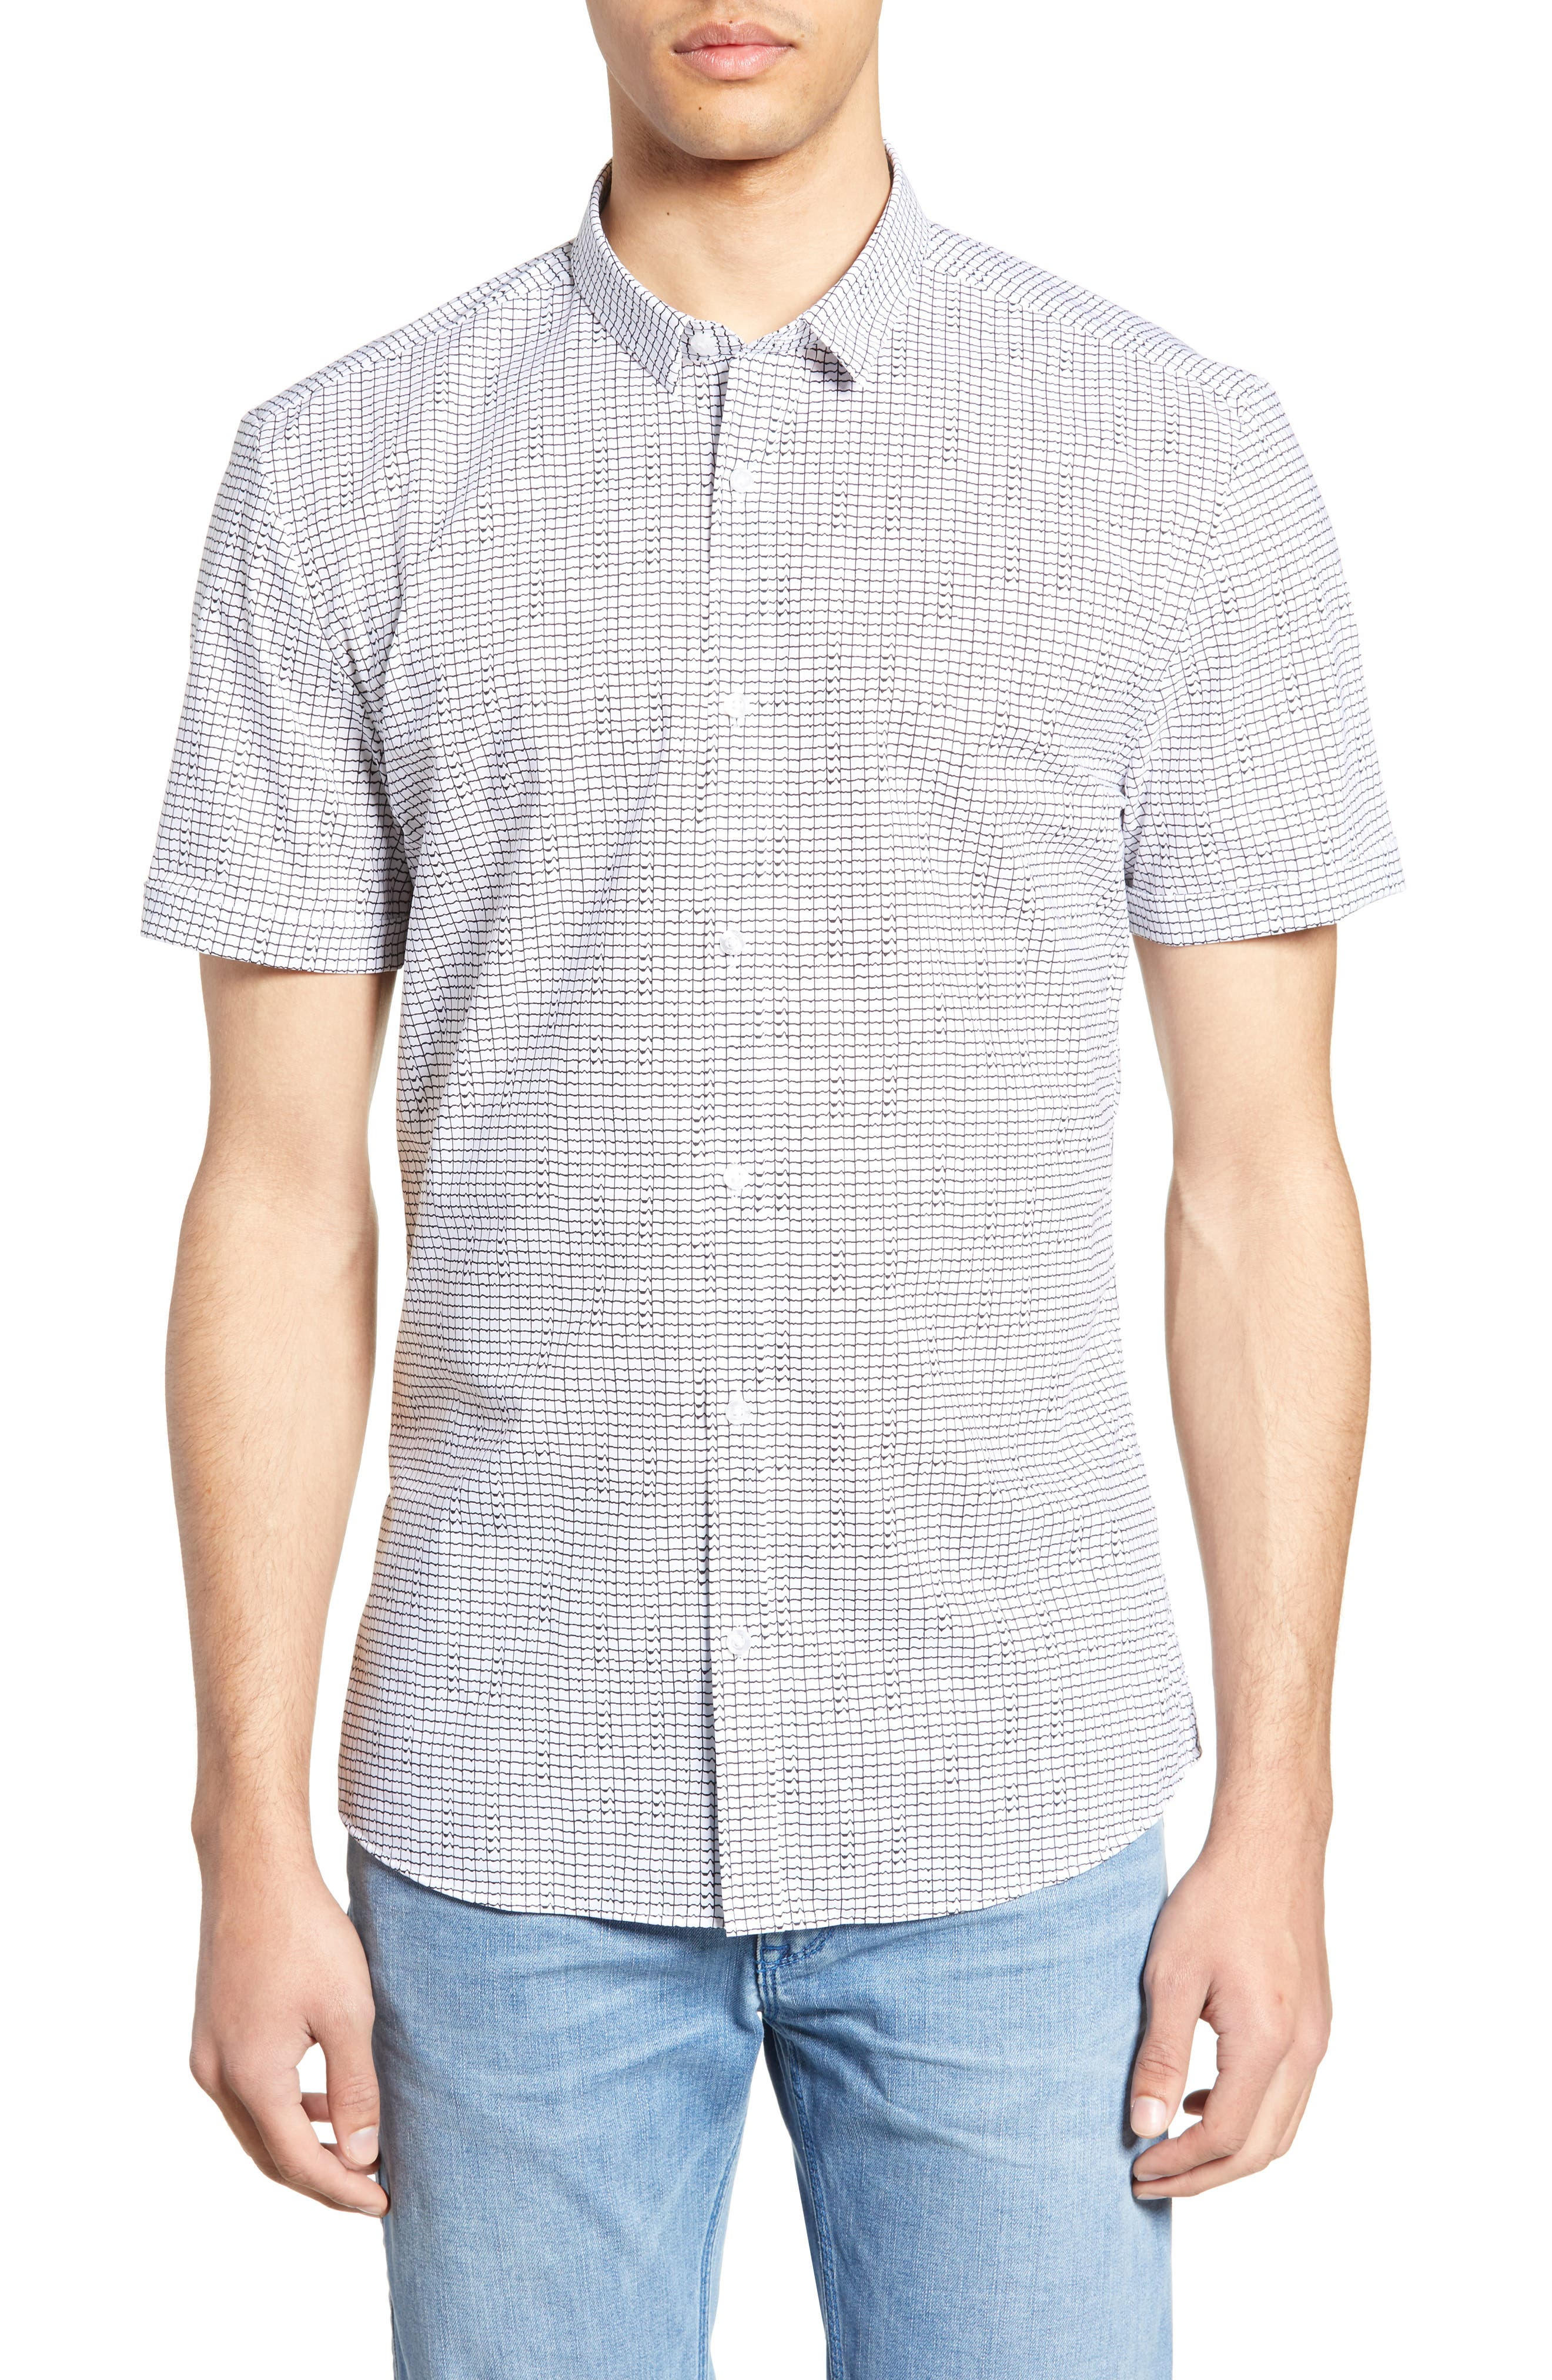 HUGO, Empson Slim Fit Print Sport Shirt, Main thumbnail 1, color, WHITE